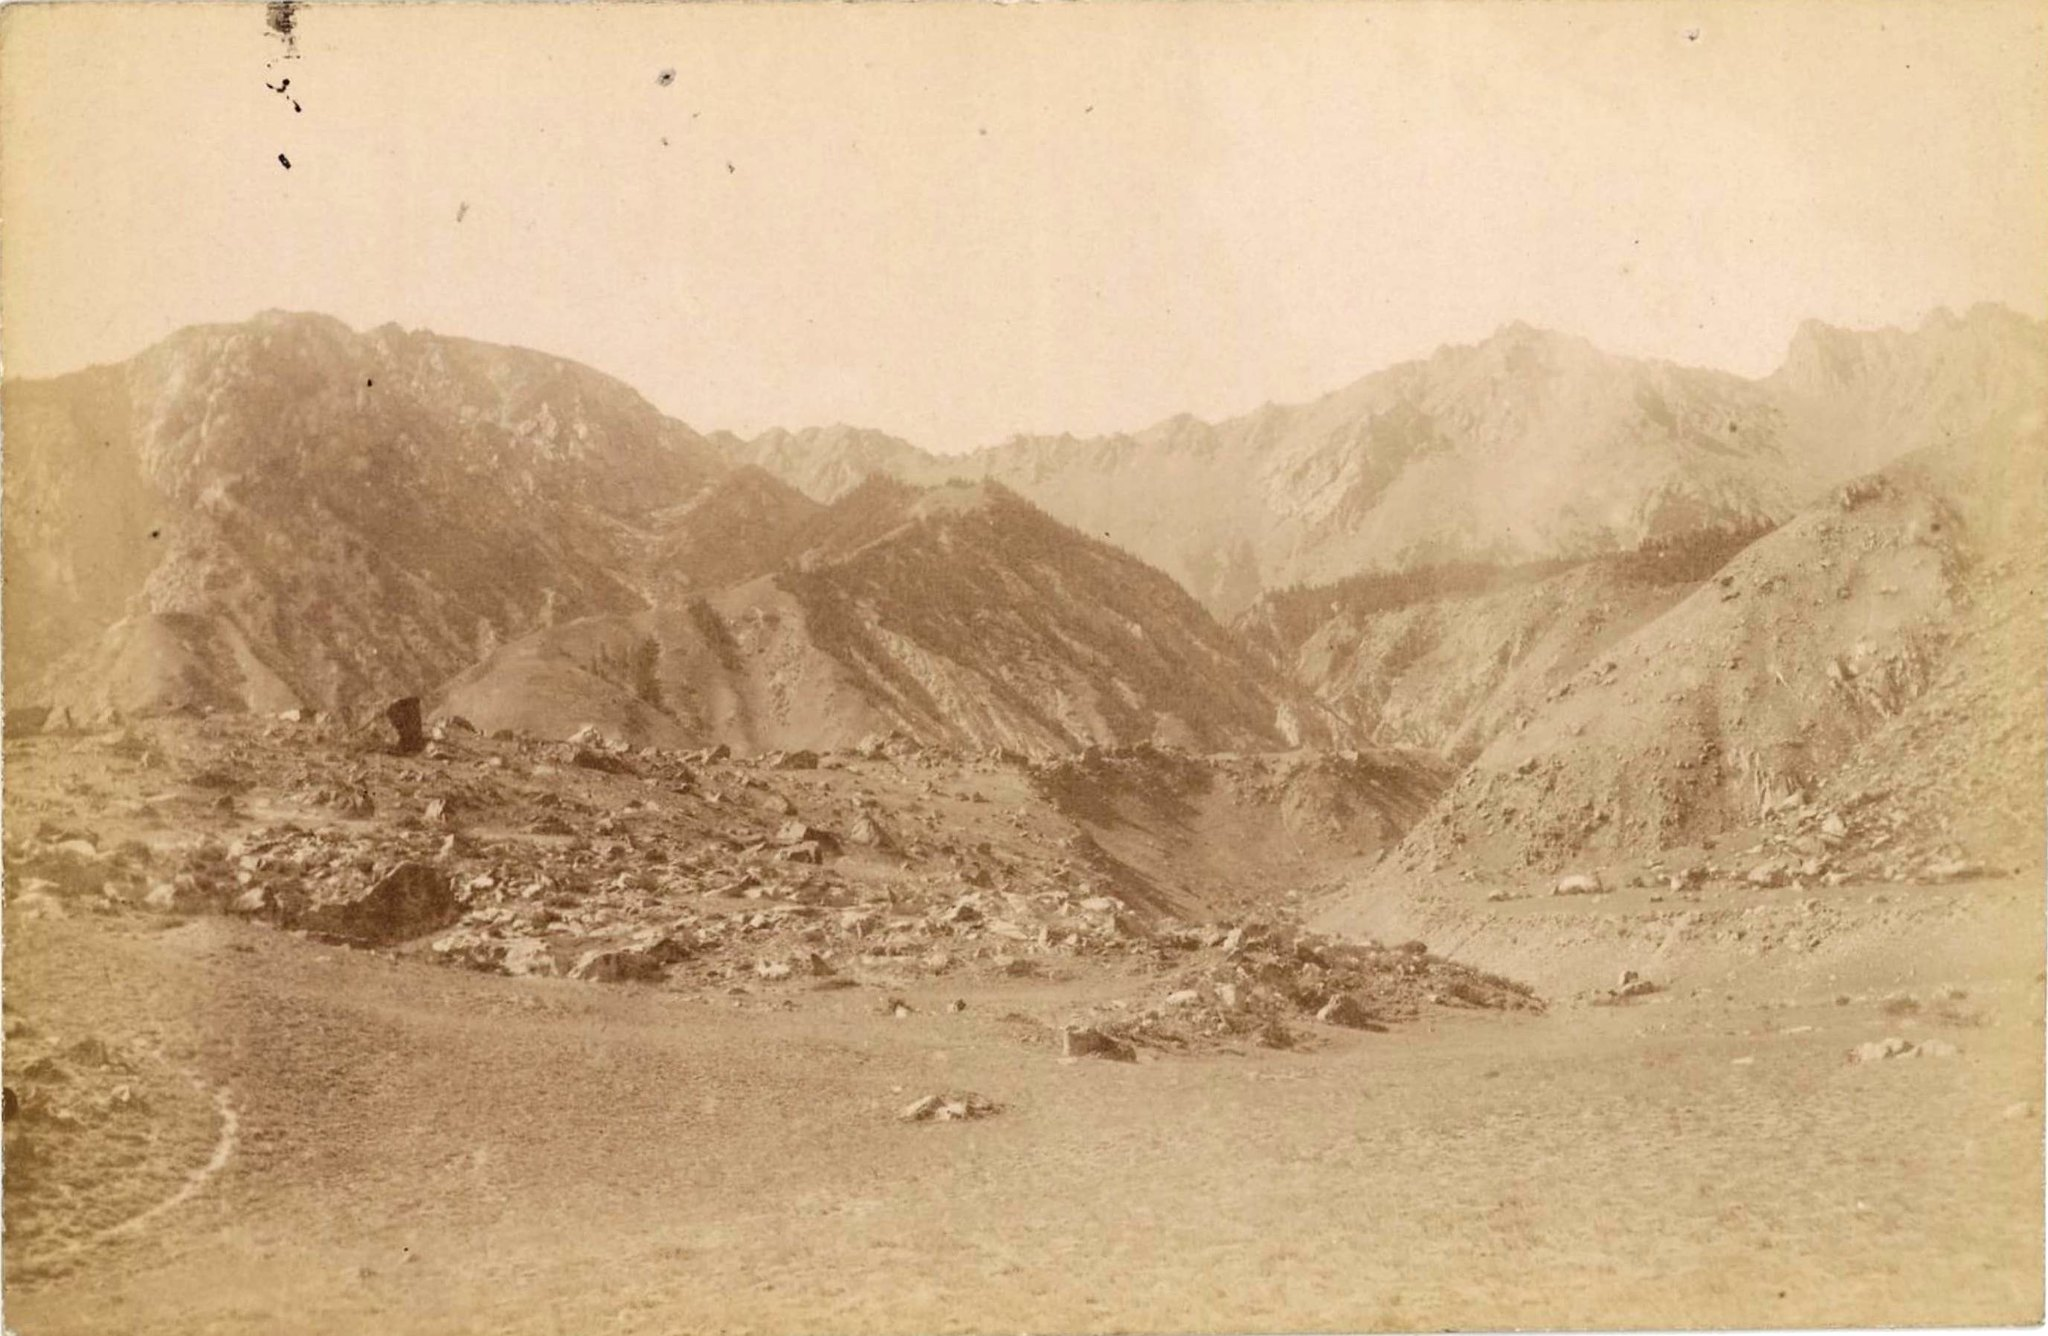 11. Ледники гор Хан-Тенгри. Ледник Западный Моцарт